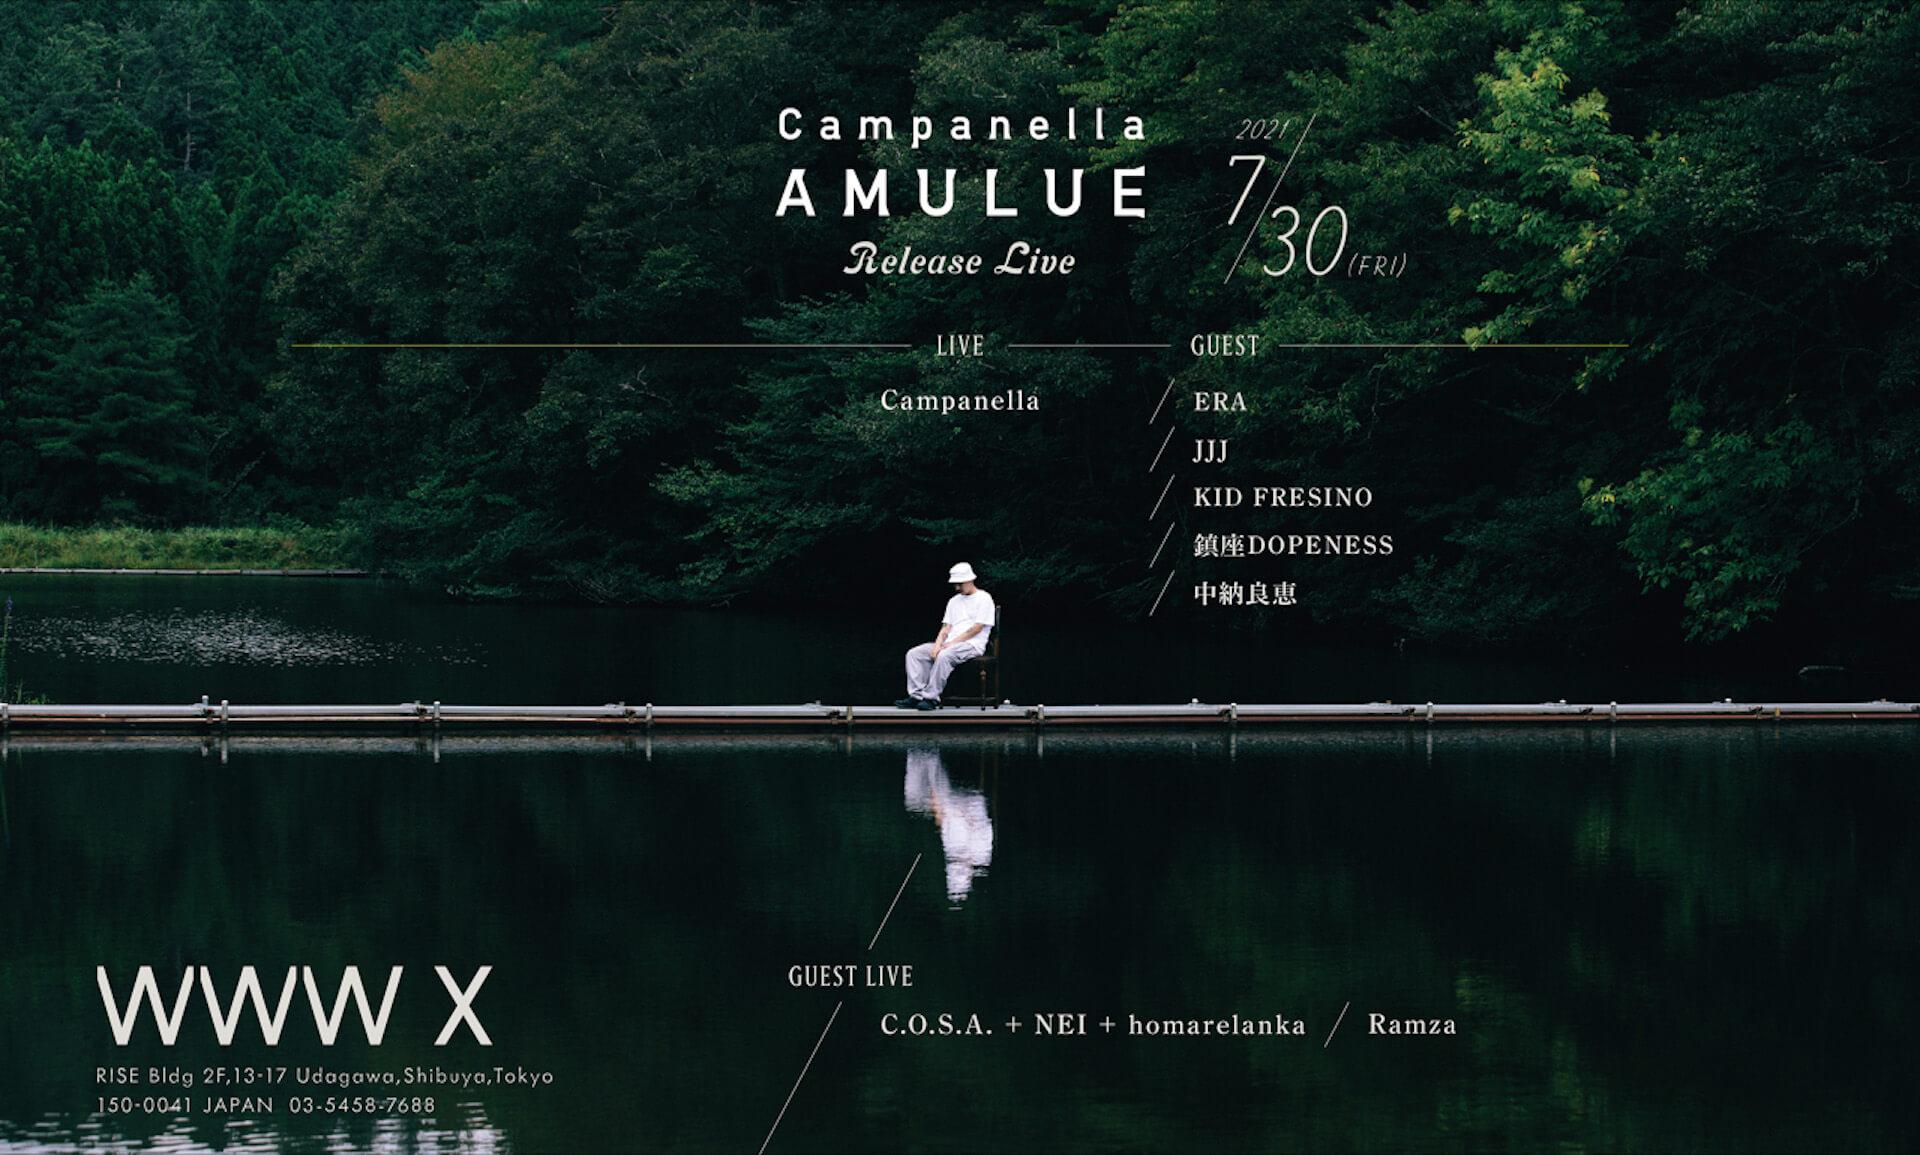 Campanella『AMULUE』リリースライブ振替公演日程が発表!C.O.S.A. + NEI + homarelankaの出演も music210610_campanella_live_main